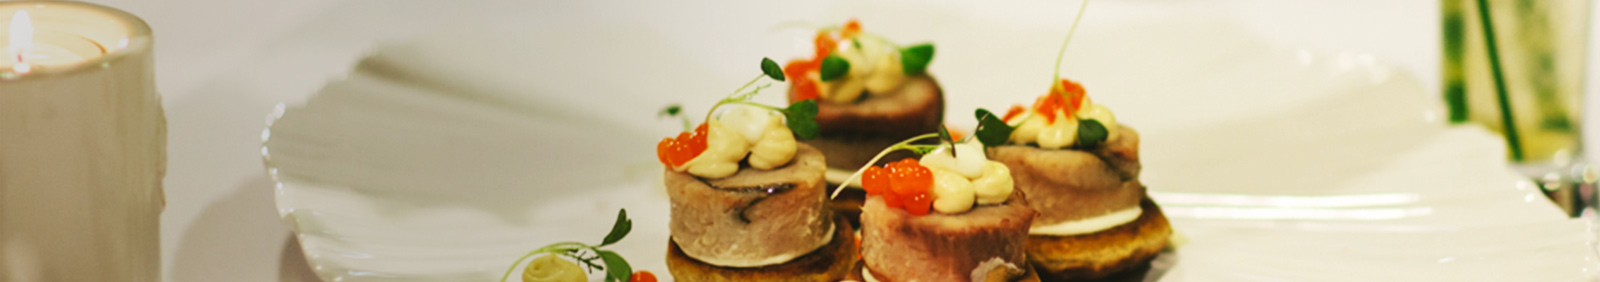 Gastronomische innovatie